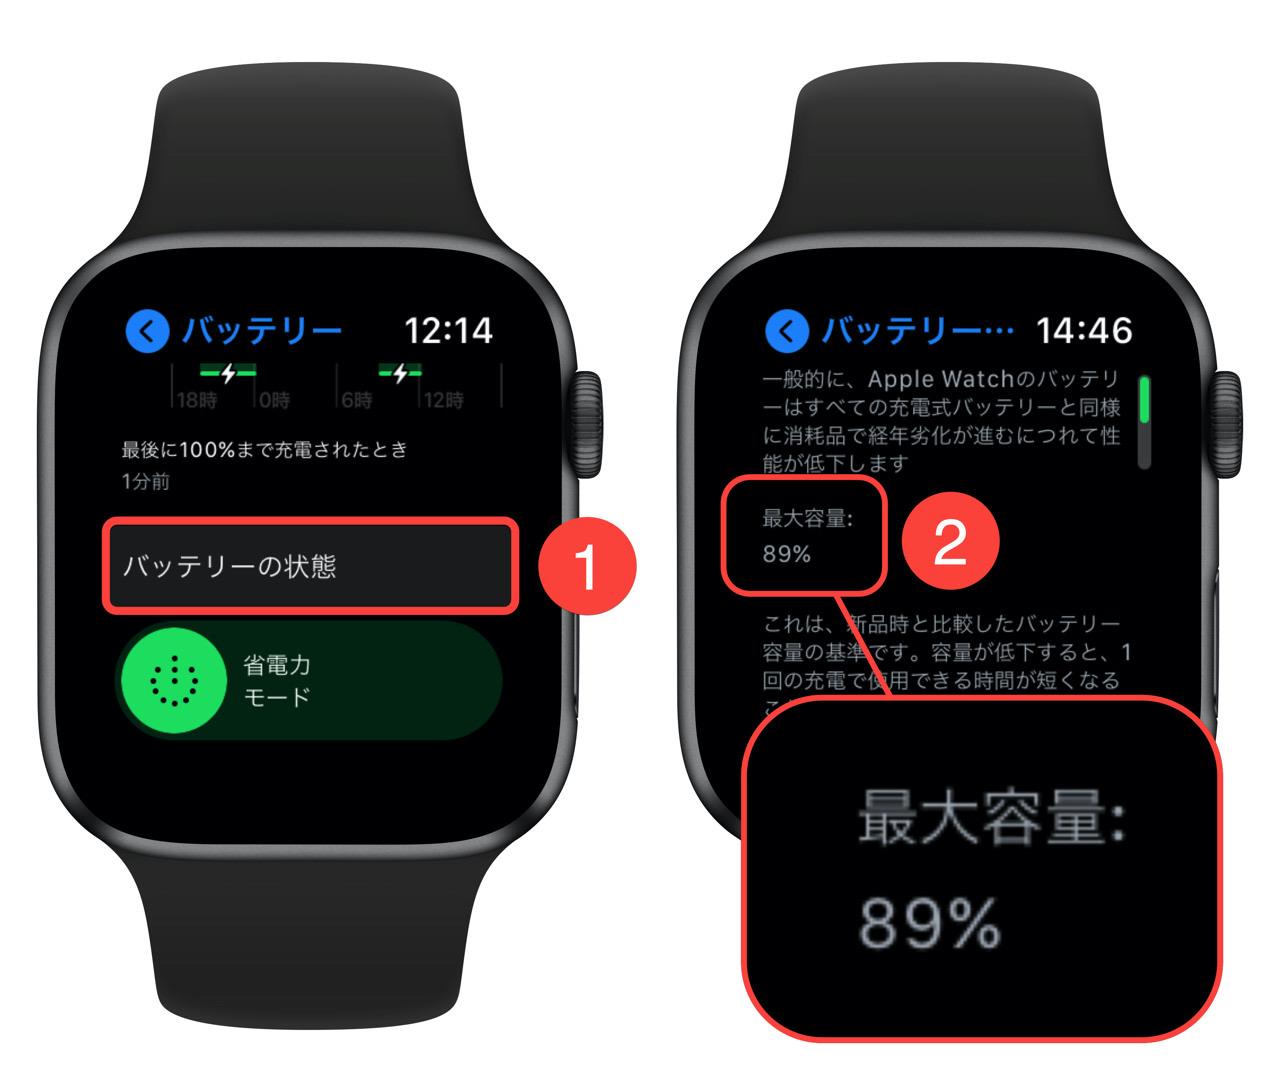 Check battery status apple watch2